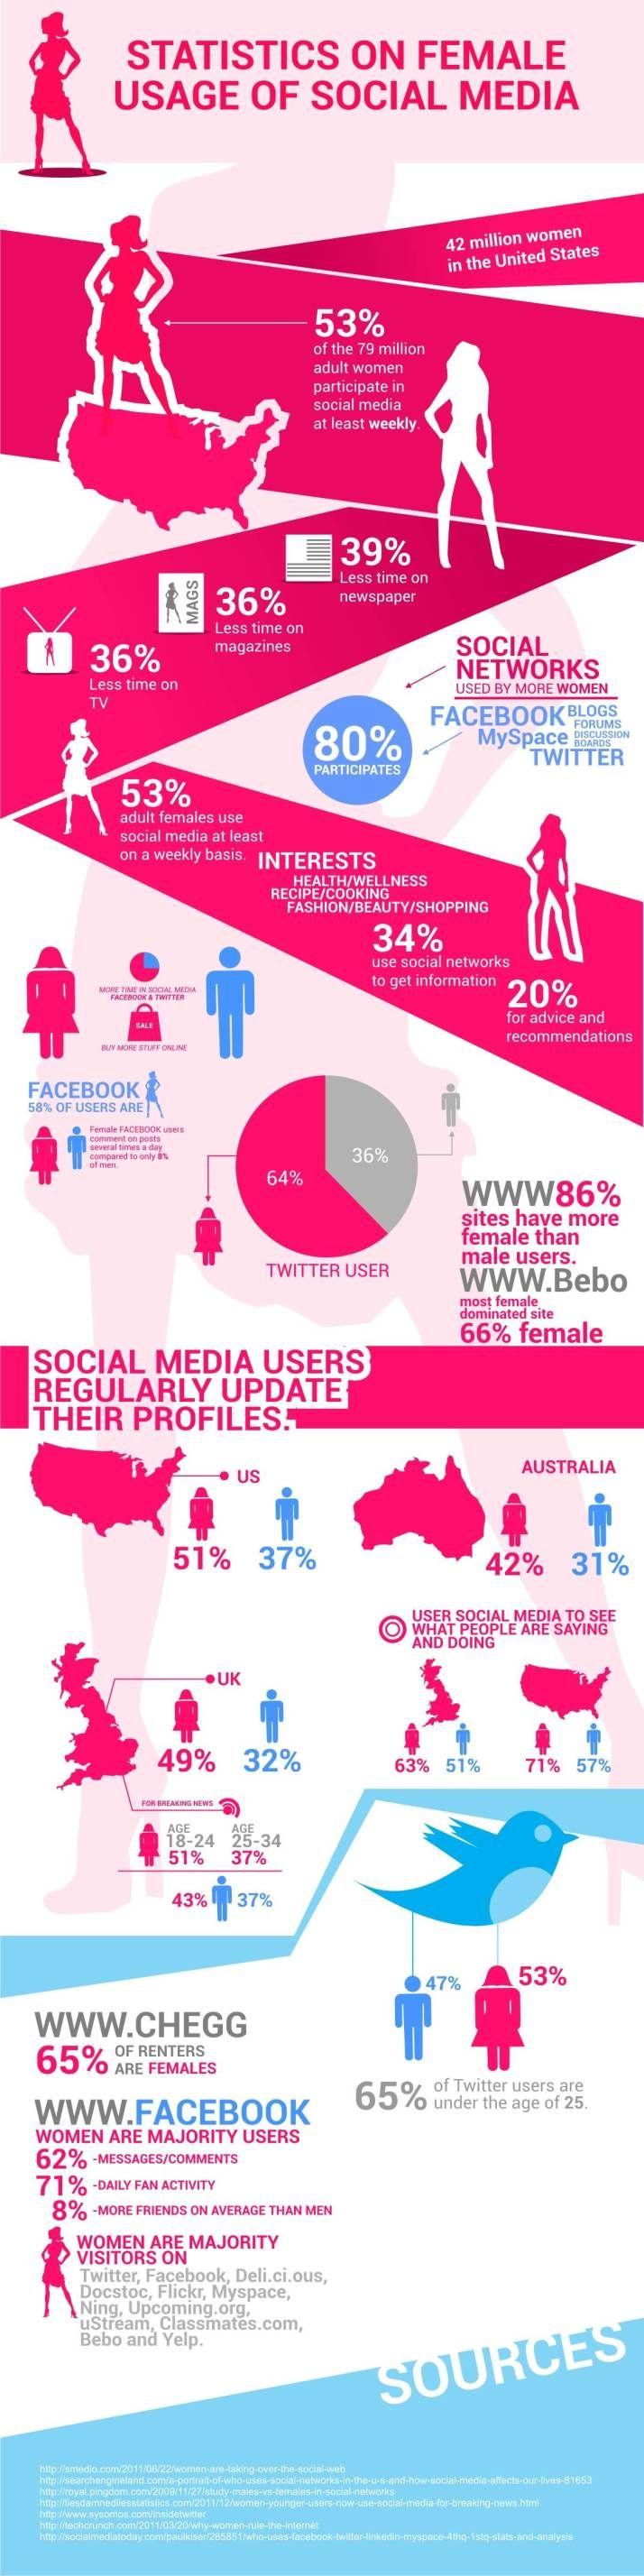 Statistics on female usage of Social Media #infografia #infographic #socialmedia